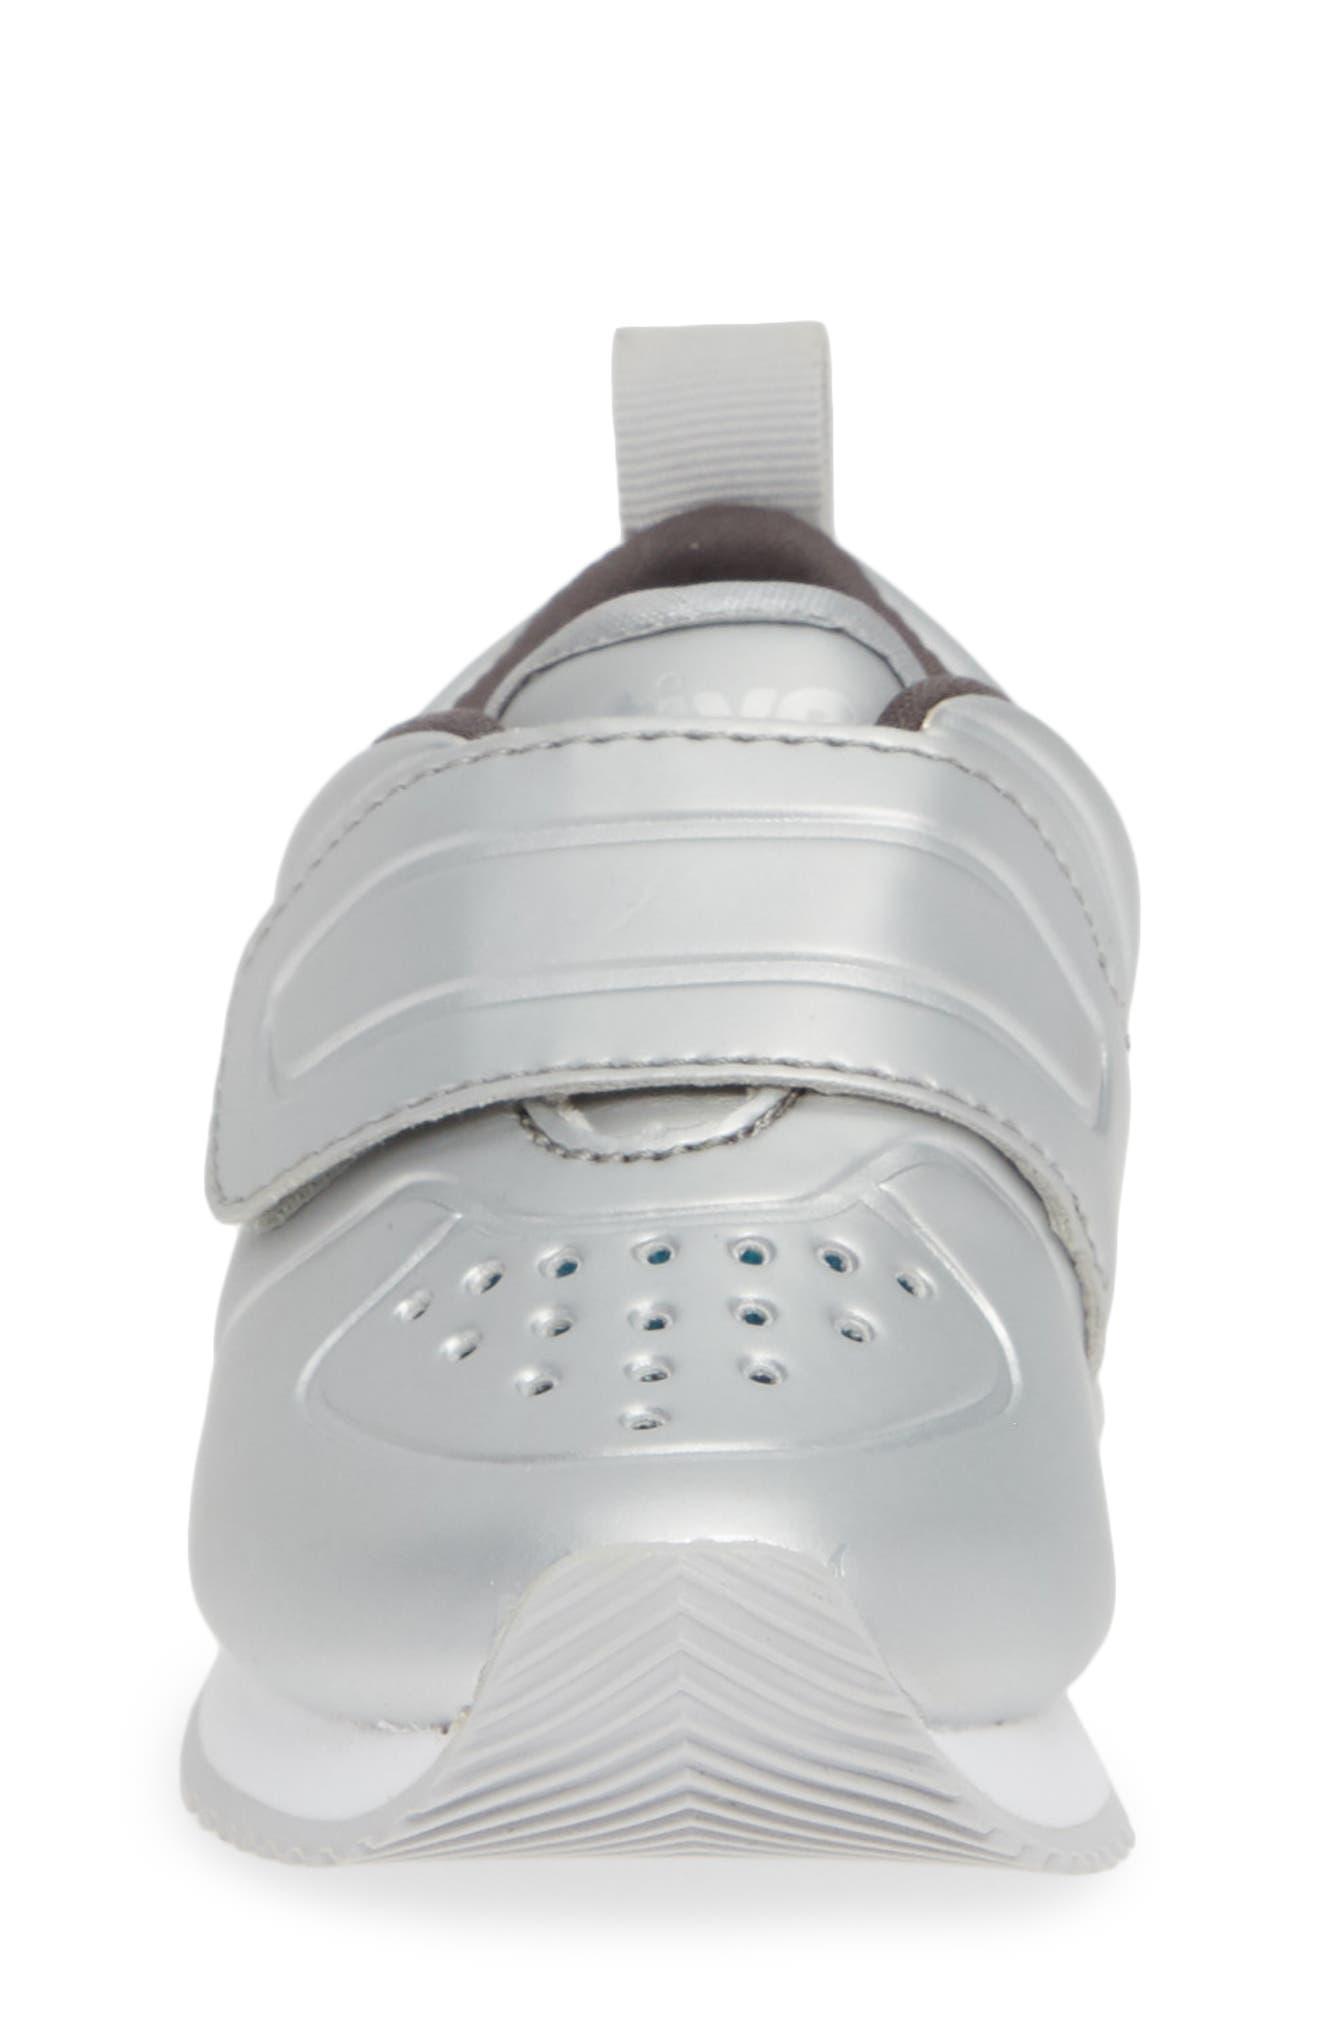 Cornell Perforated Metallic Sneaker,                             Alternate thumbnail 4, color,                             SILVER/ WHITE/ DUBLIN GREY